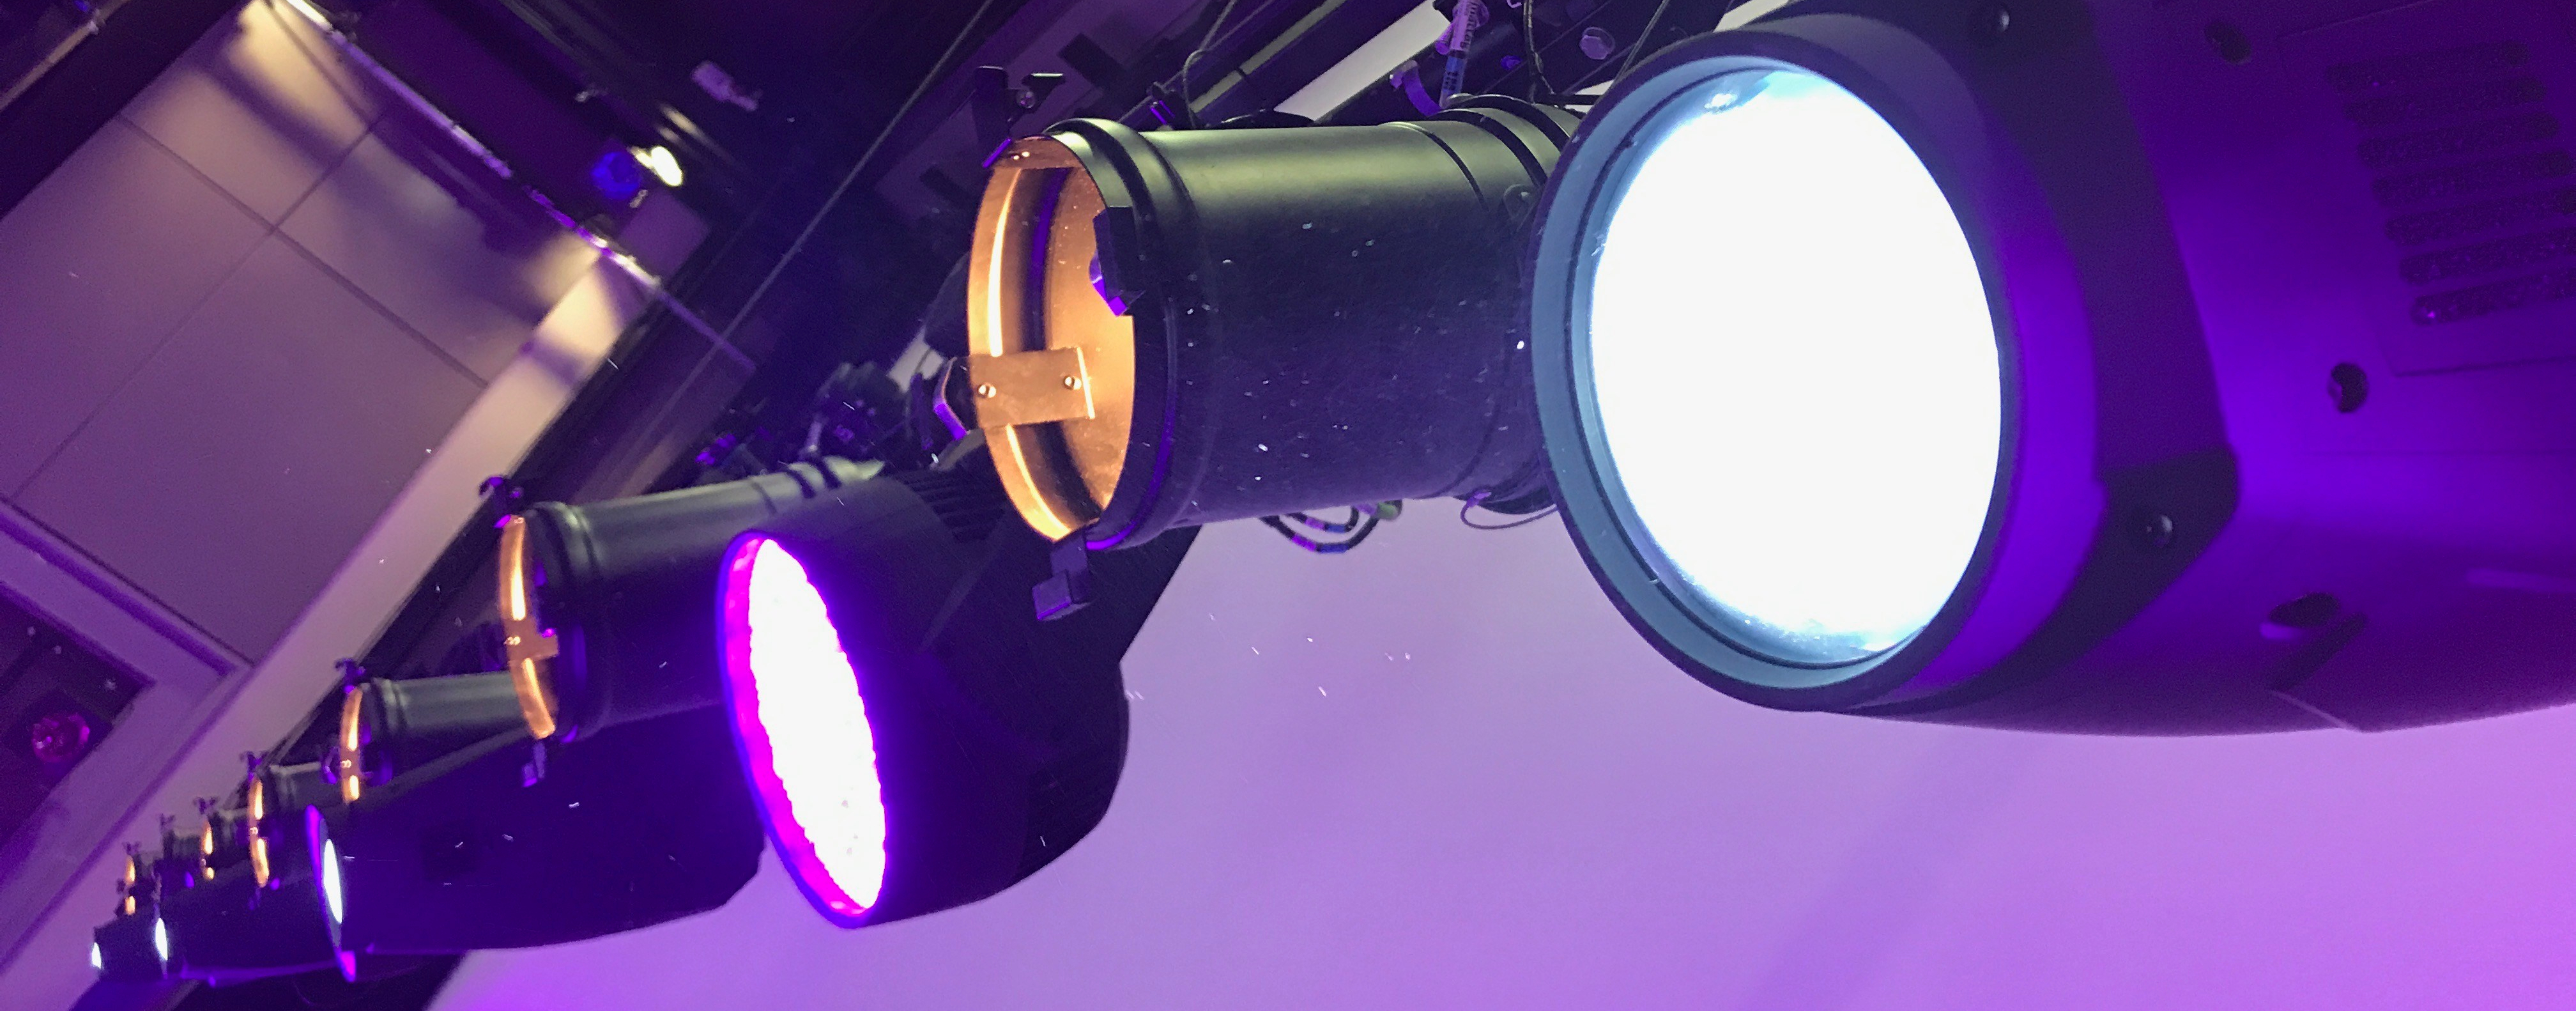 Chauvet Maverick MK1 Spots and Rogue R3 Washes Hire